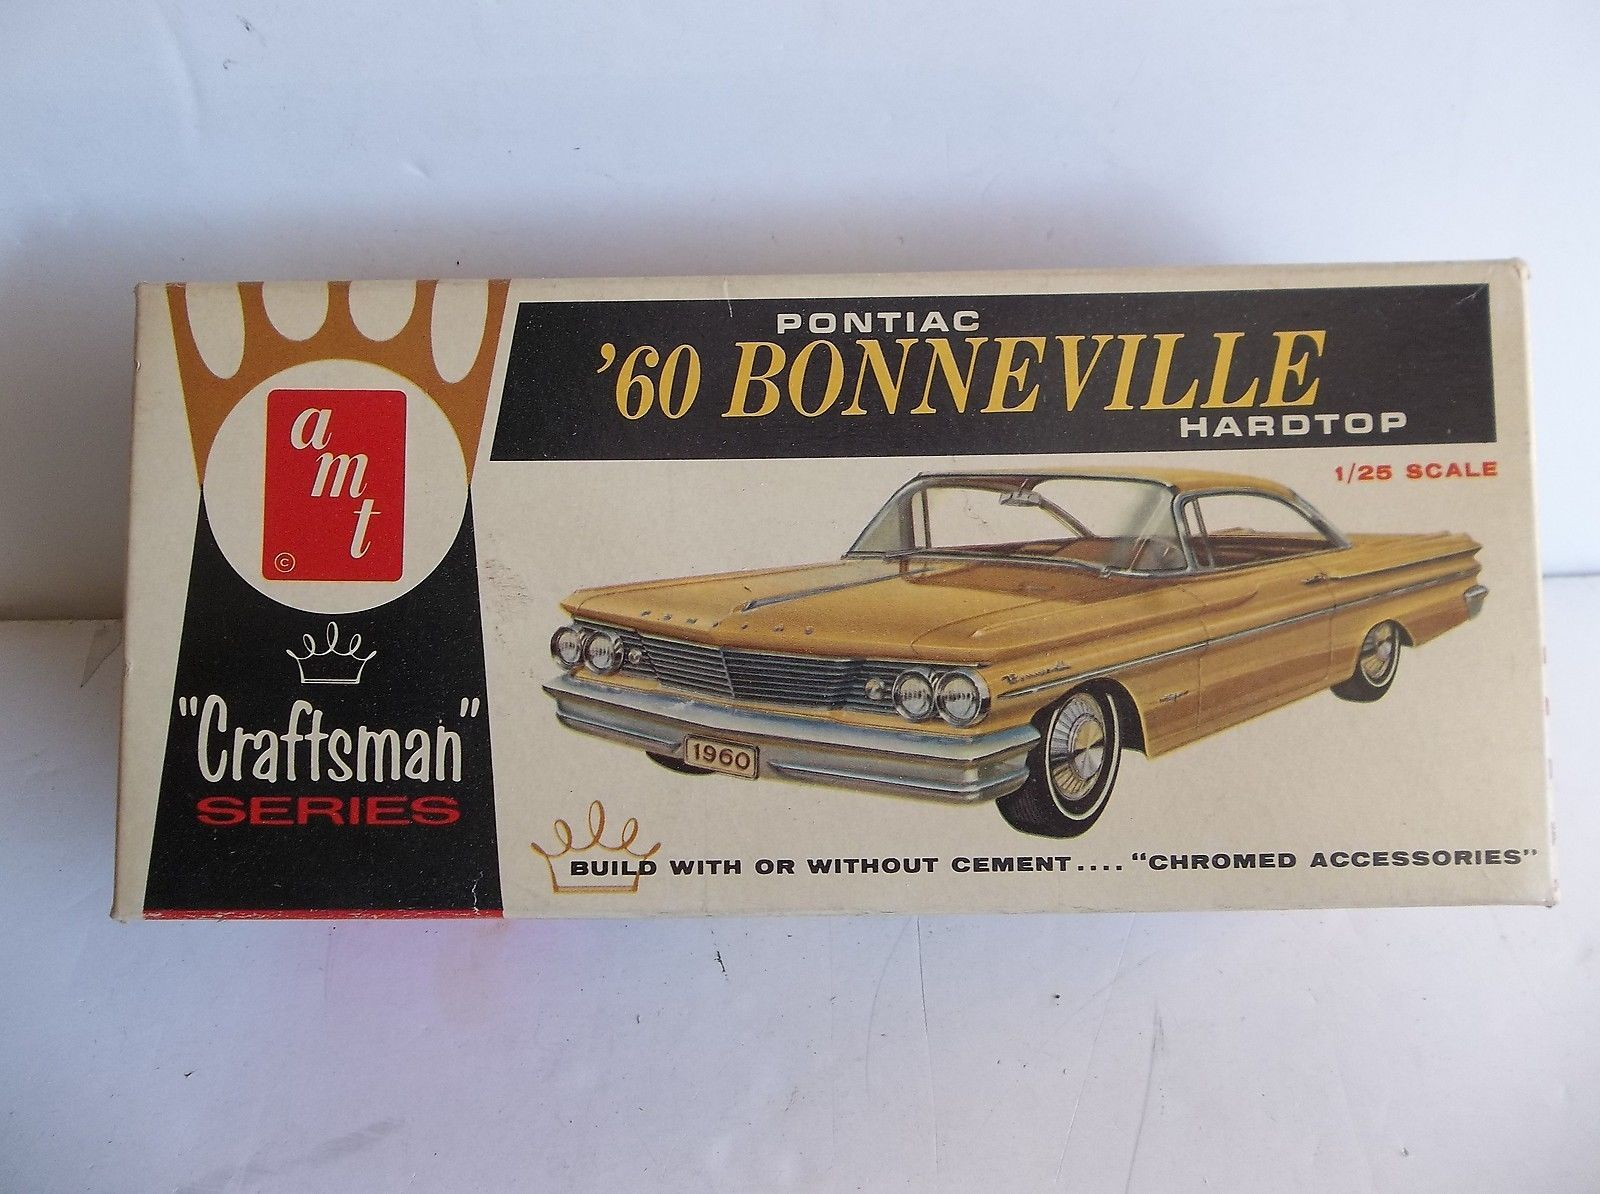 Vintage Model Kit Amt 1960 Pontiac Bonneville Nice Station Wagon In Toys Hobbies Models Kits Automotive Ebay